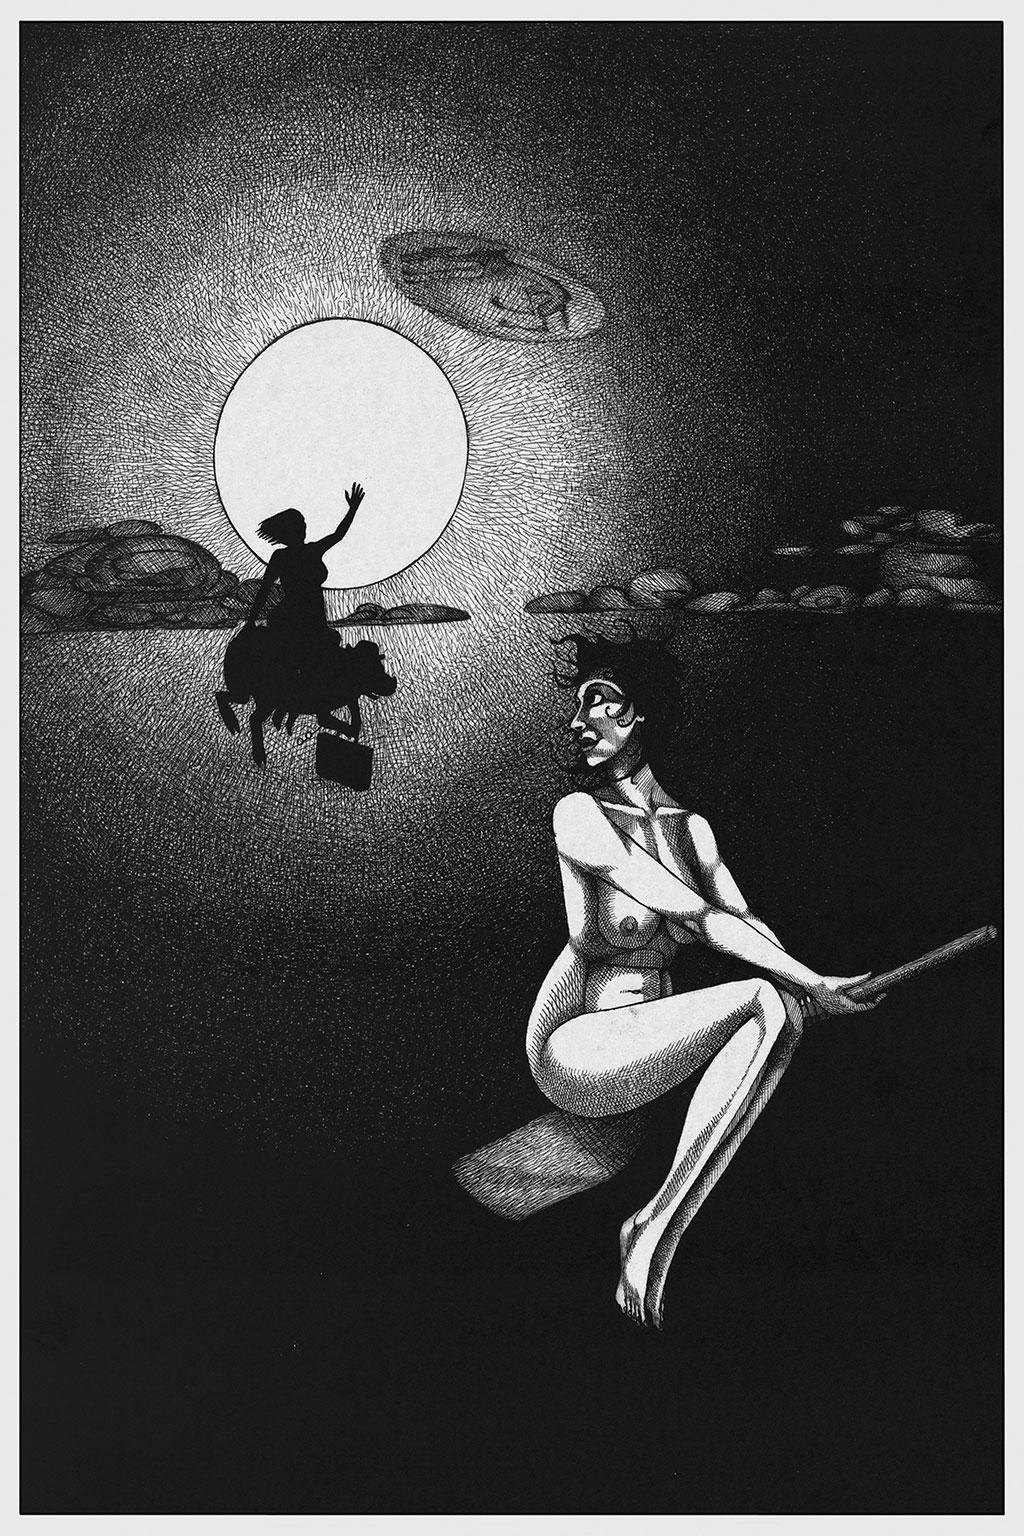 Иллюстрация Мастер и Маргарита Чарли Стоун 12